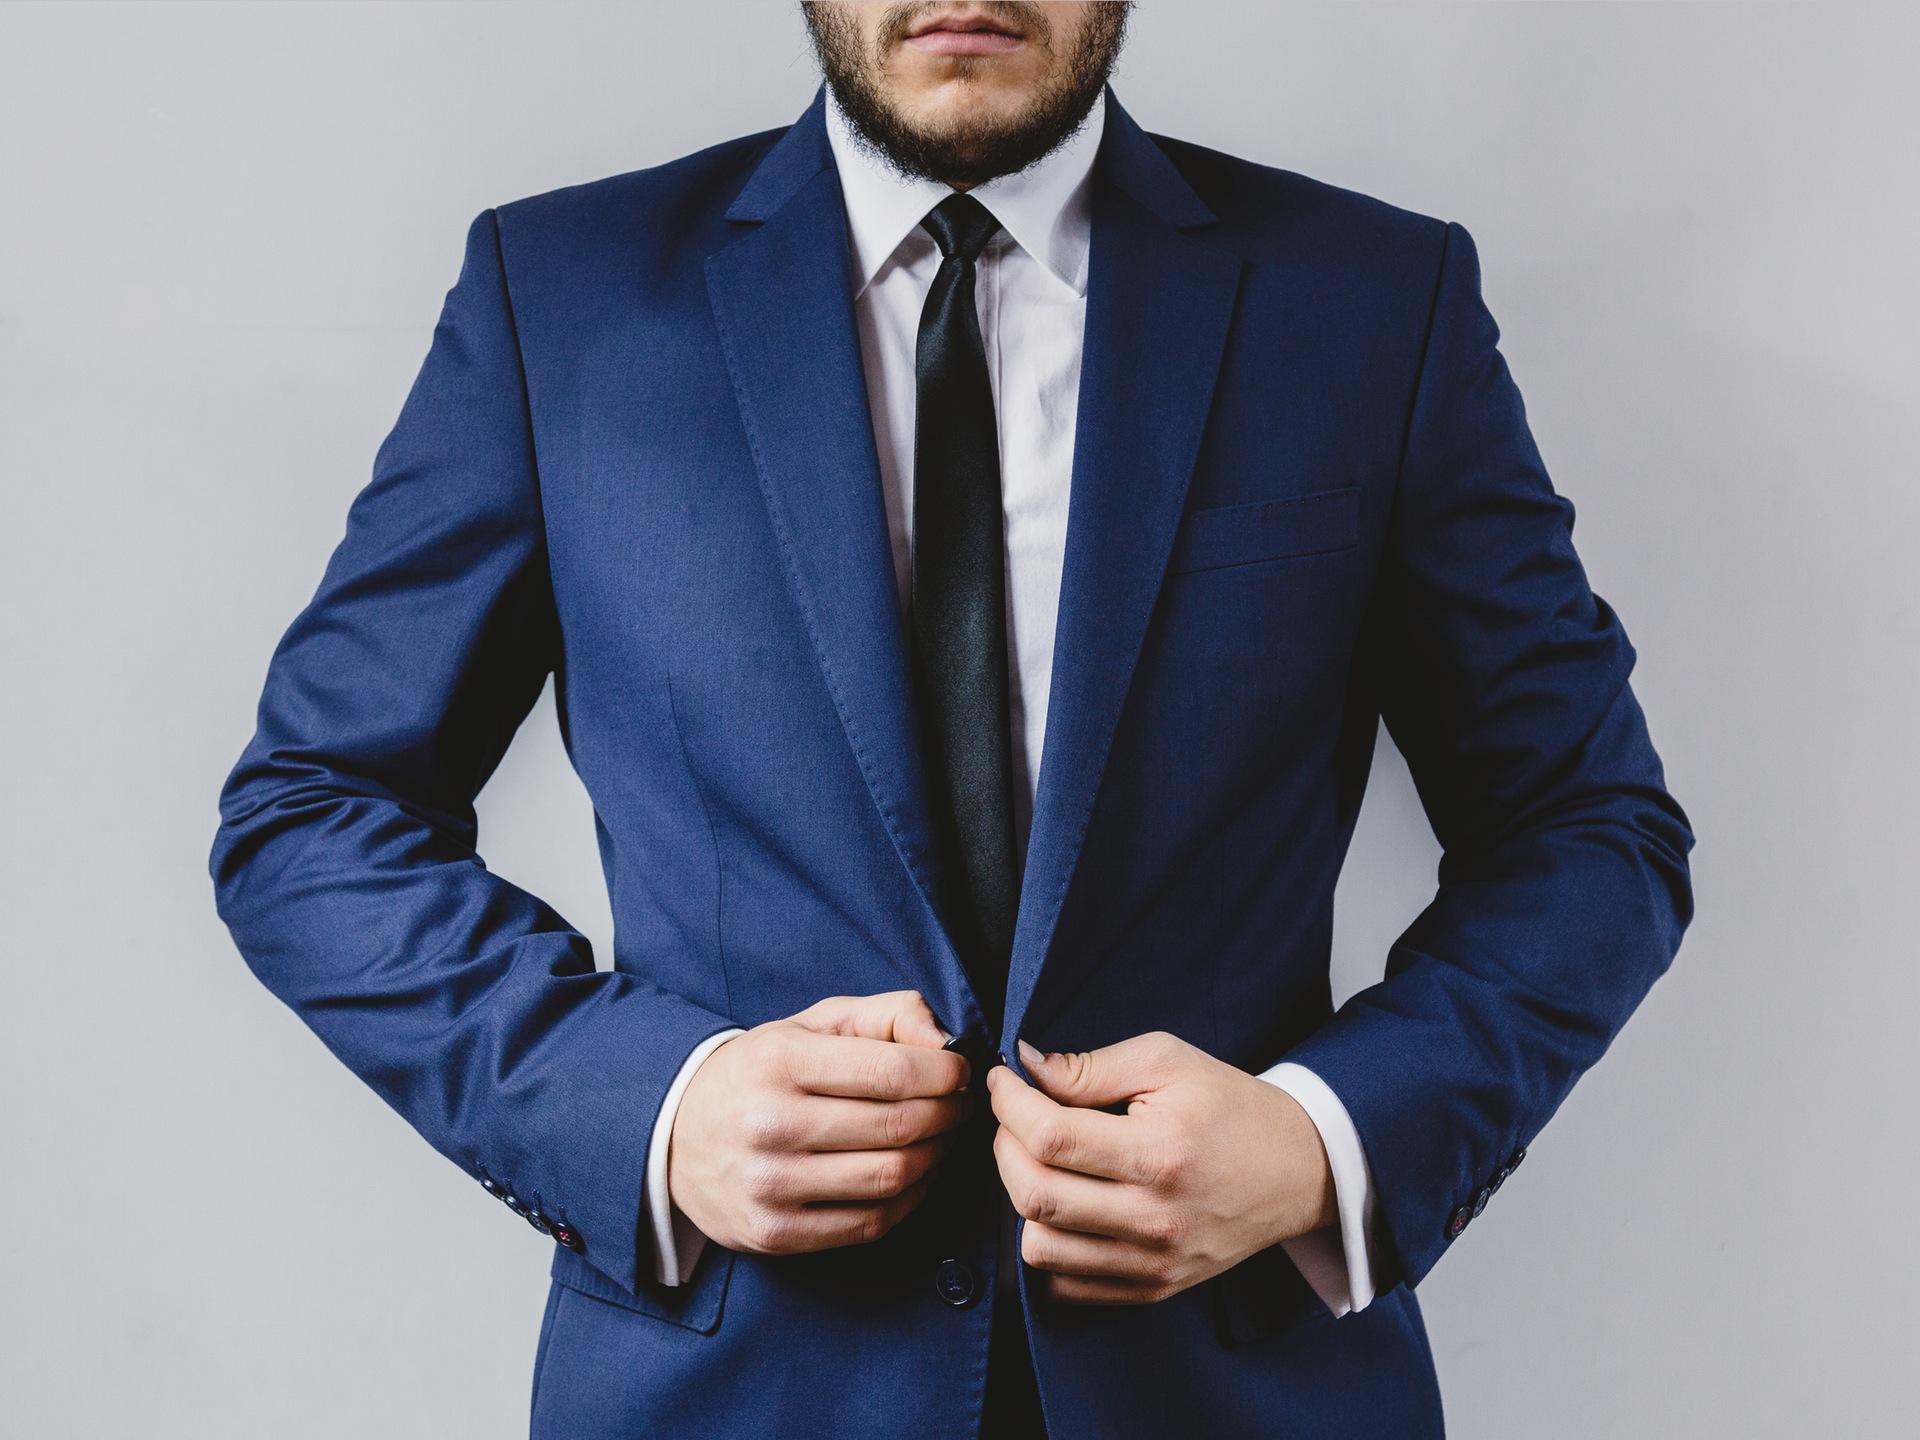 suit-portrait-preparation-wedding.jpg